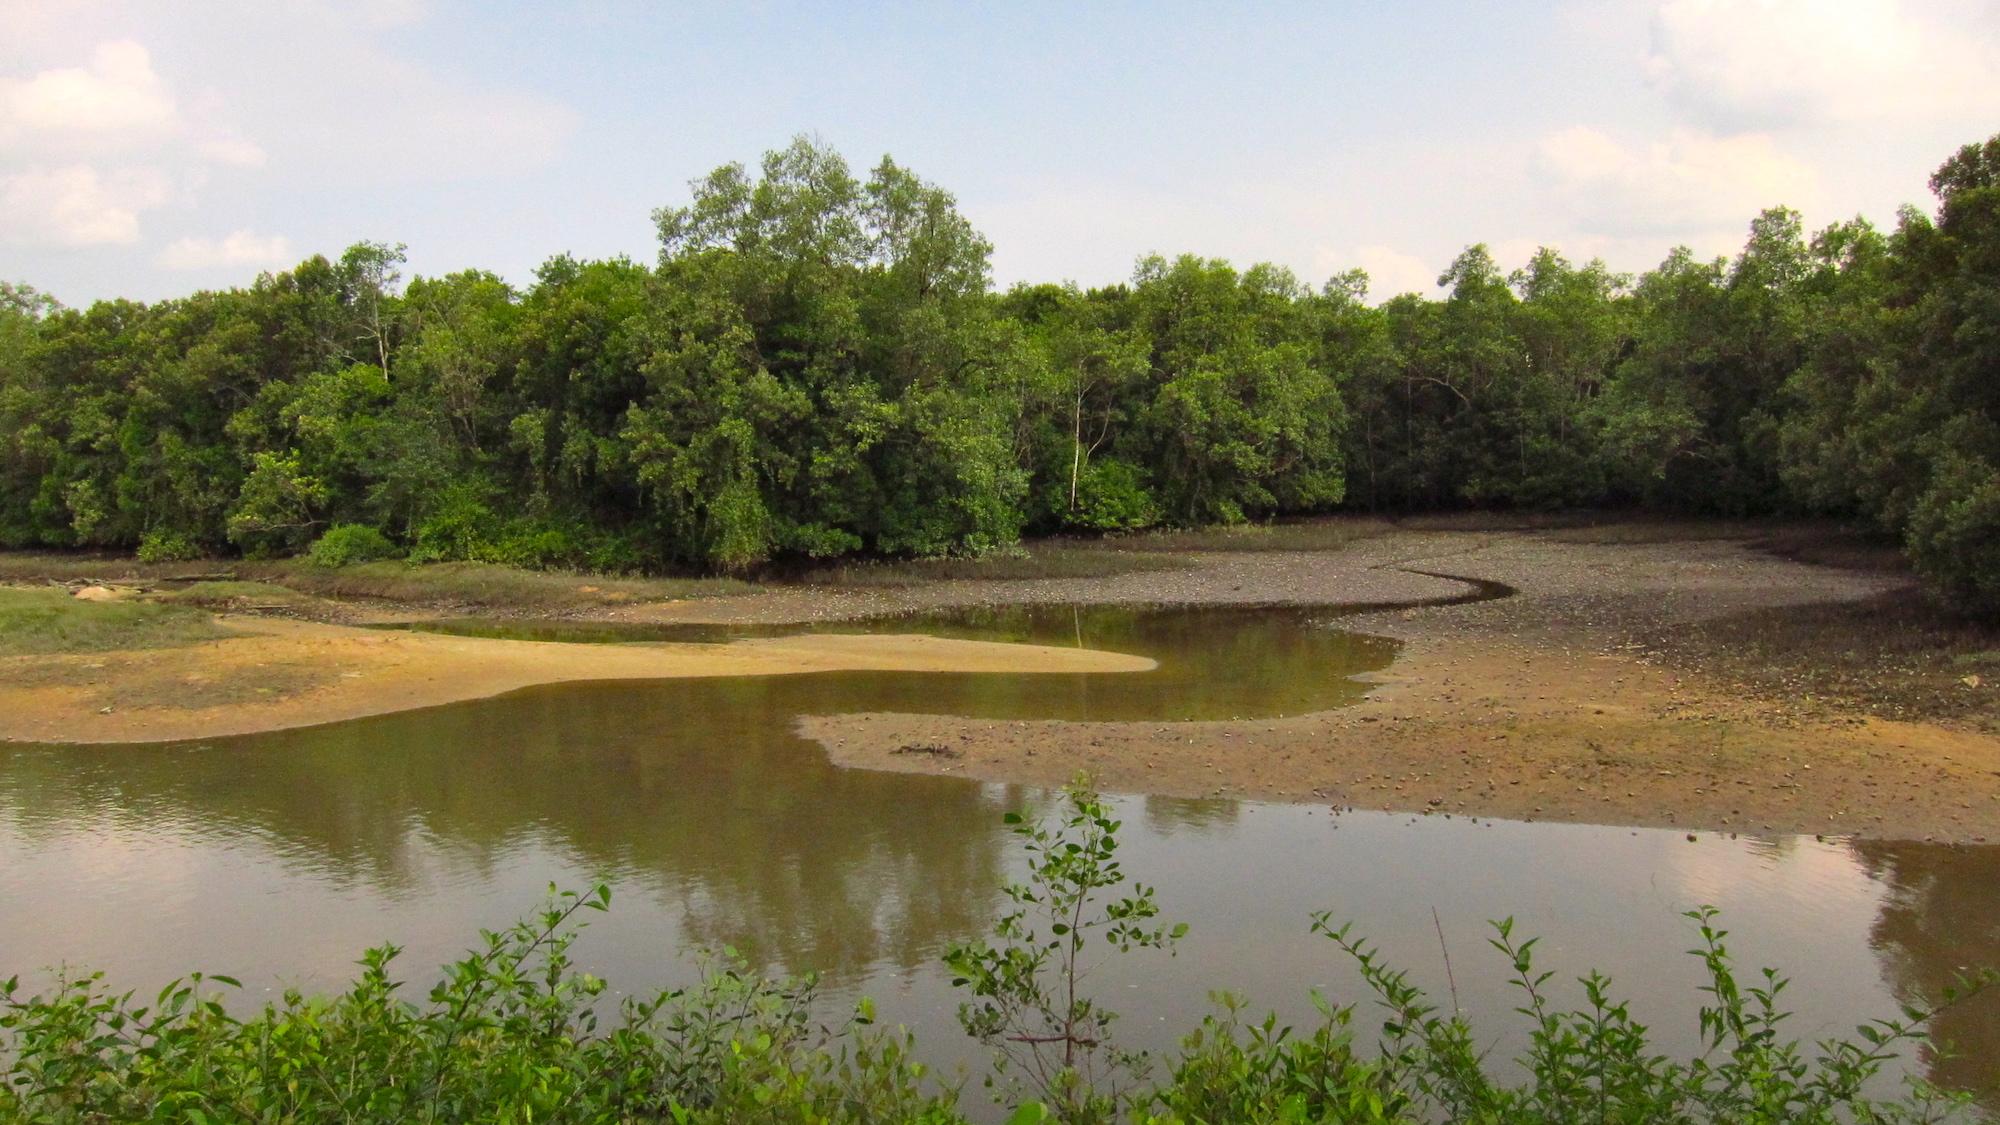 Dataran lumpur yang terbuka saat air surut di Sungei Bulah Wetland Reserve menyajikan hidangan prasmanan untuk burung.  Foto oleh Qingwu Zhou melalui Wikimedia Commons (CC BY-SA 3.0).